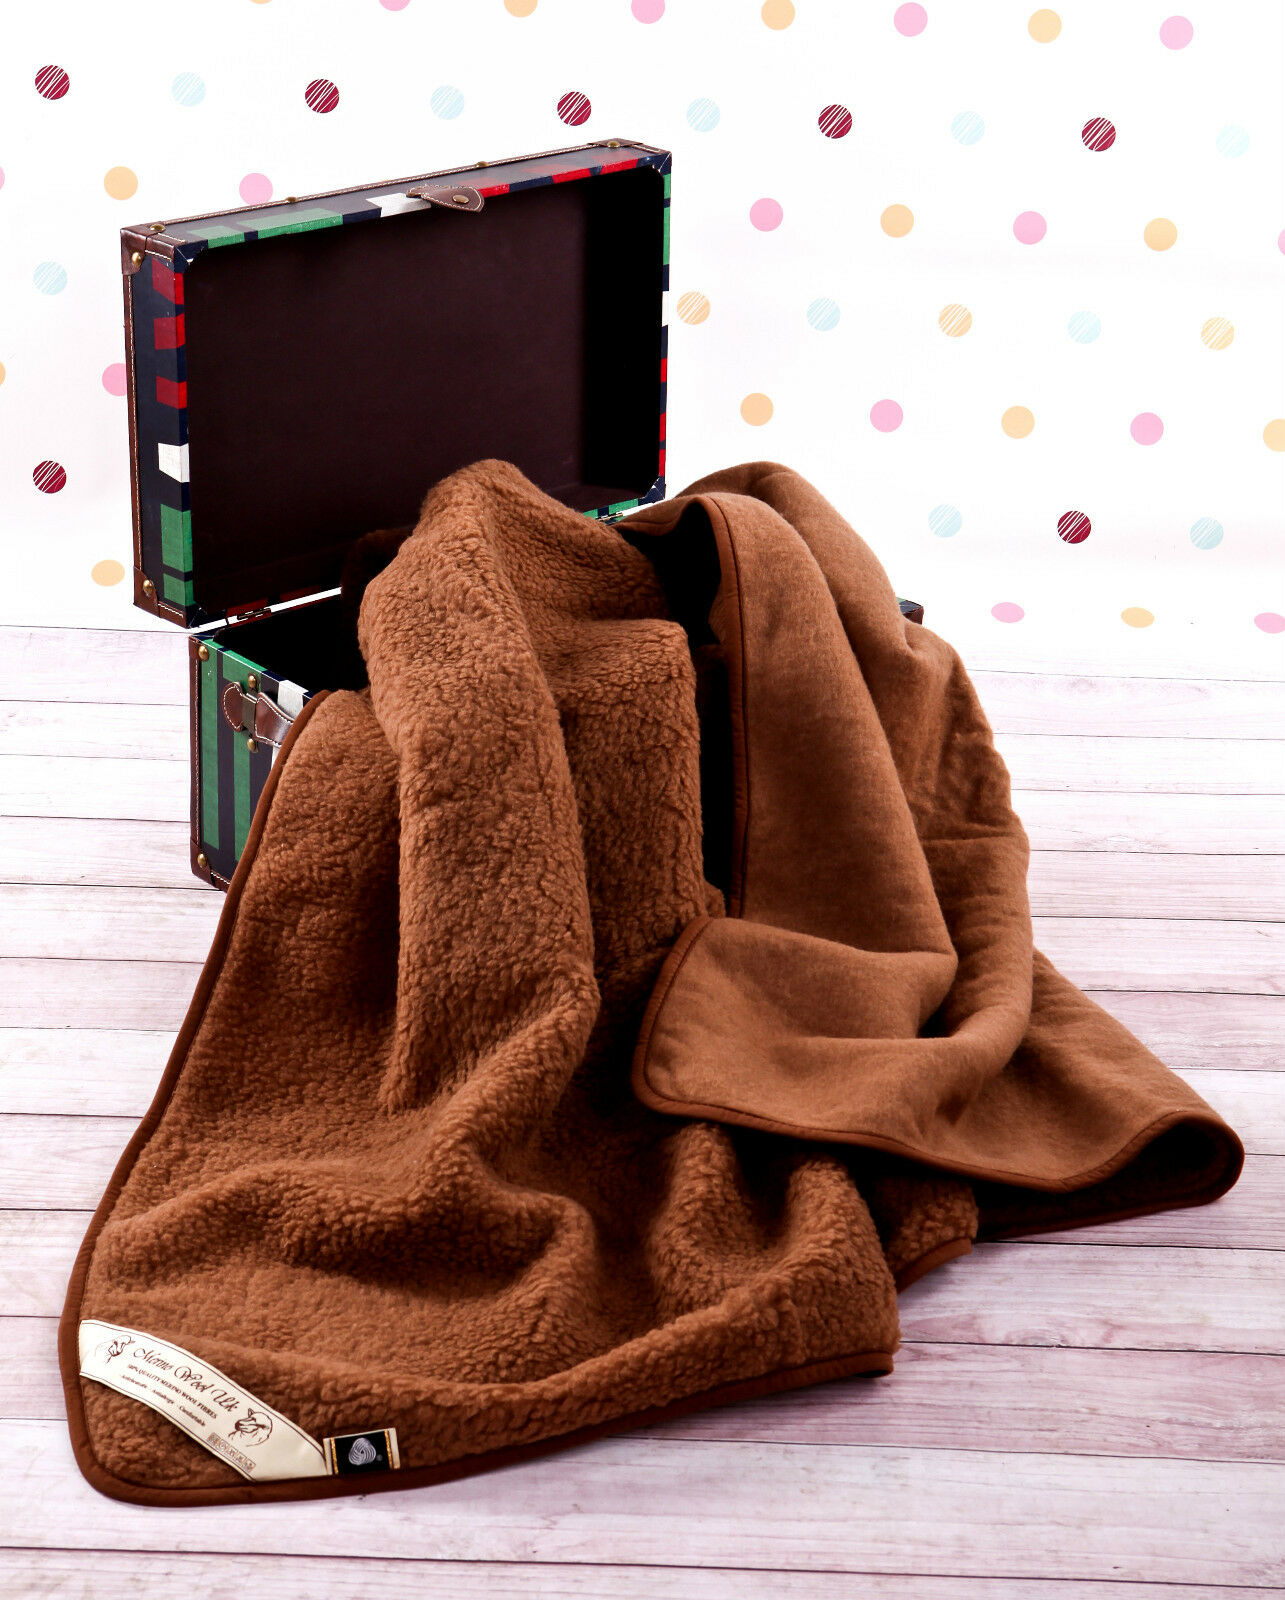 Sonderangebot! 100% Merino Wool Decke King Size Wolle Fleece 200 X 200 CM Brown